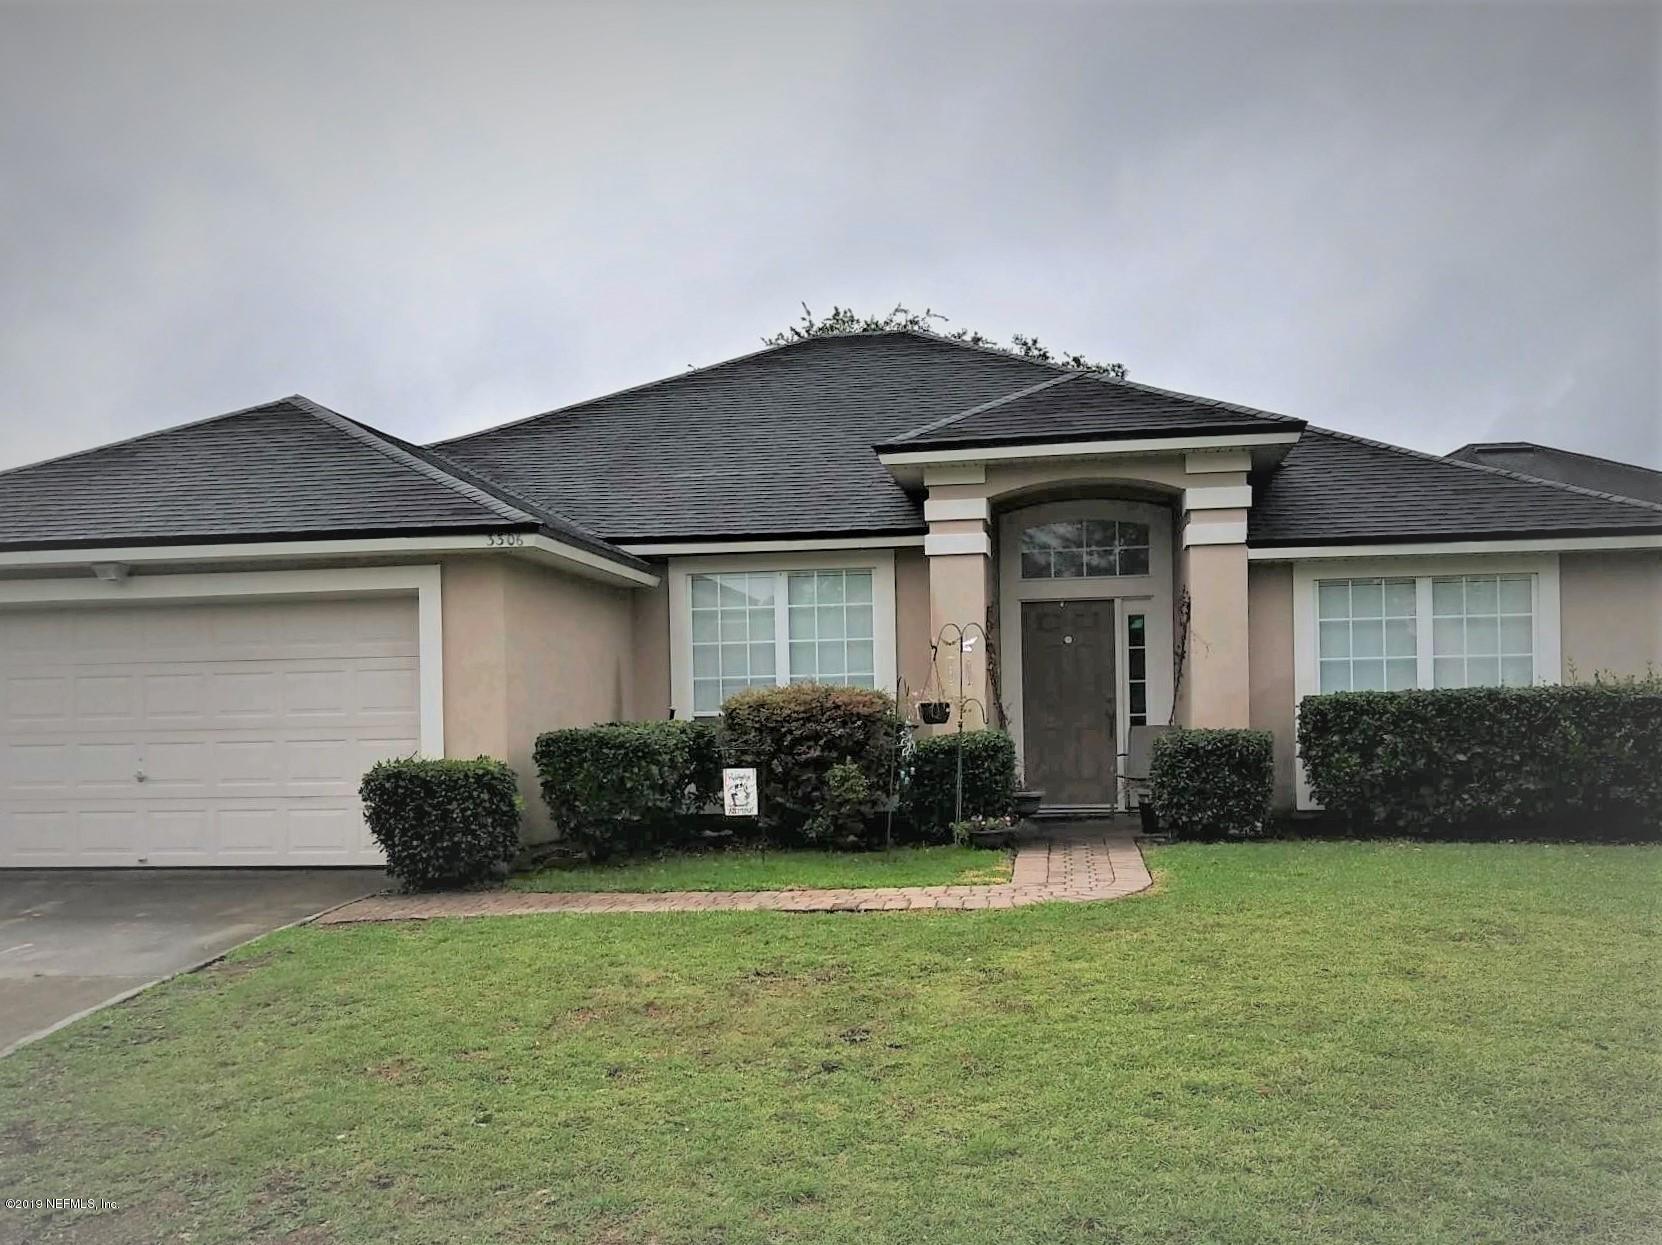 3306 HORSESHOE TRAIL, ORANGE PARK, FLORIDA 32065, 4 Bedrooms Bedrooms, ,2 BathroomsBathrooms,Residential - single family,For sale,HORSESHOE TRAIL,990560